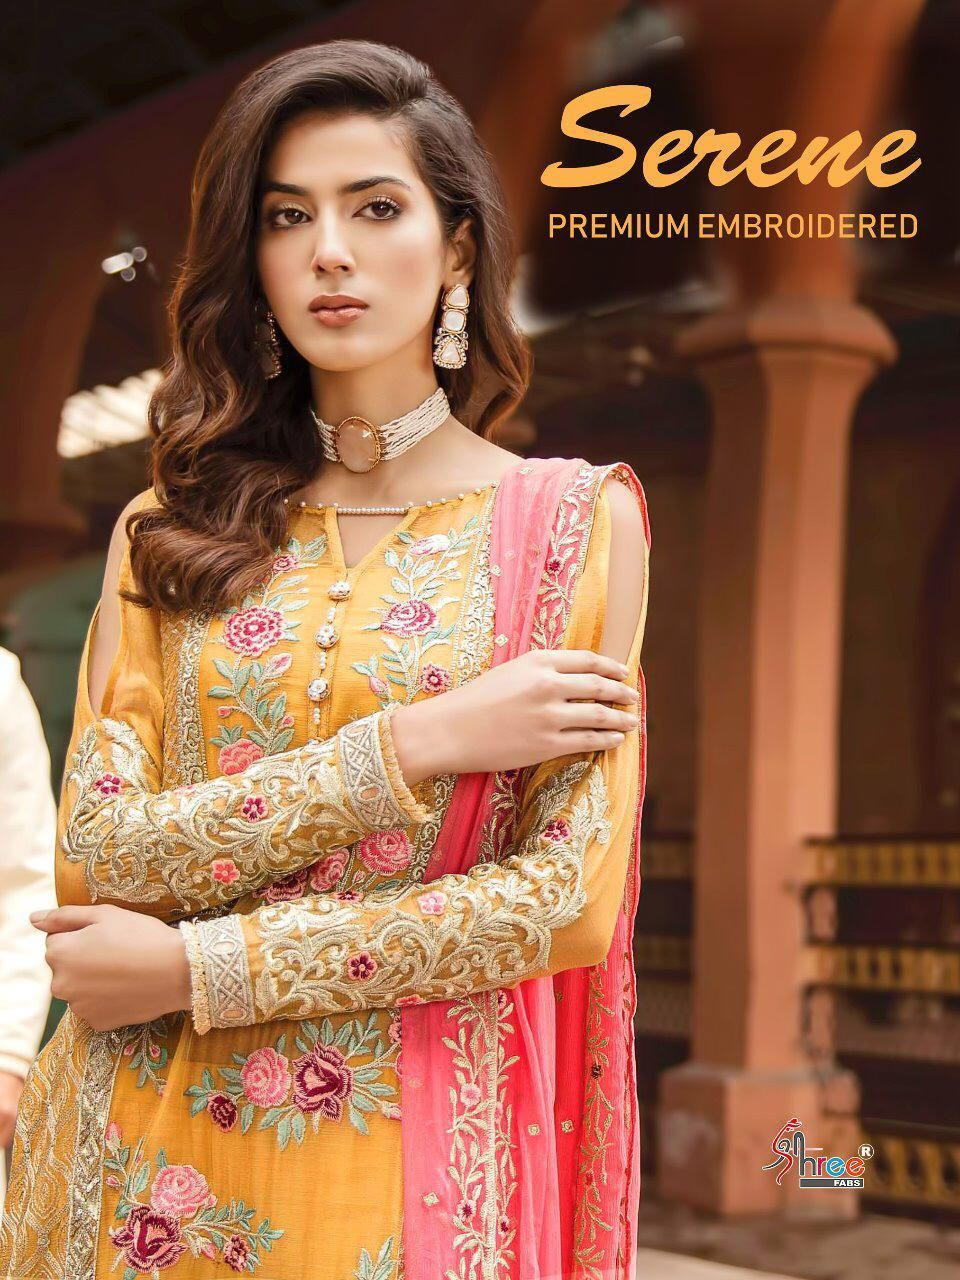 7e5edf4c14 Shree fabs Serene premium embroidered Pakistani salwaar suit catalogue  wholesale price surat at Wholesale Price. INR 7494 pcs 6.